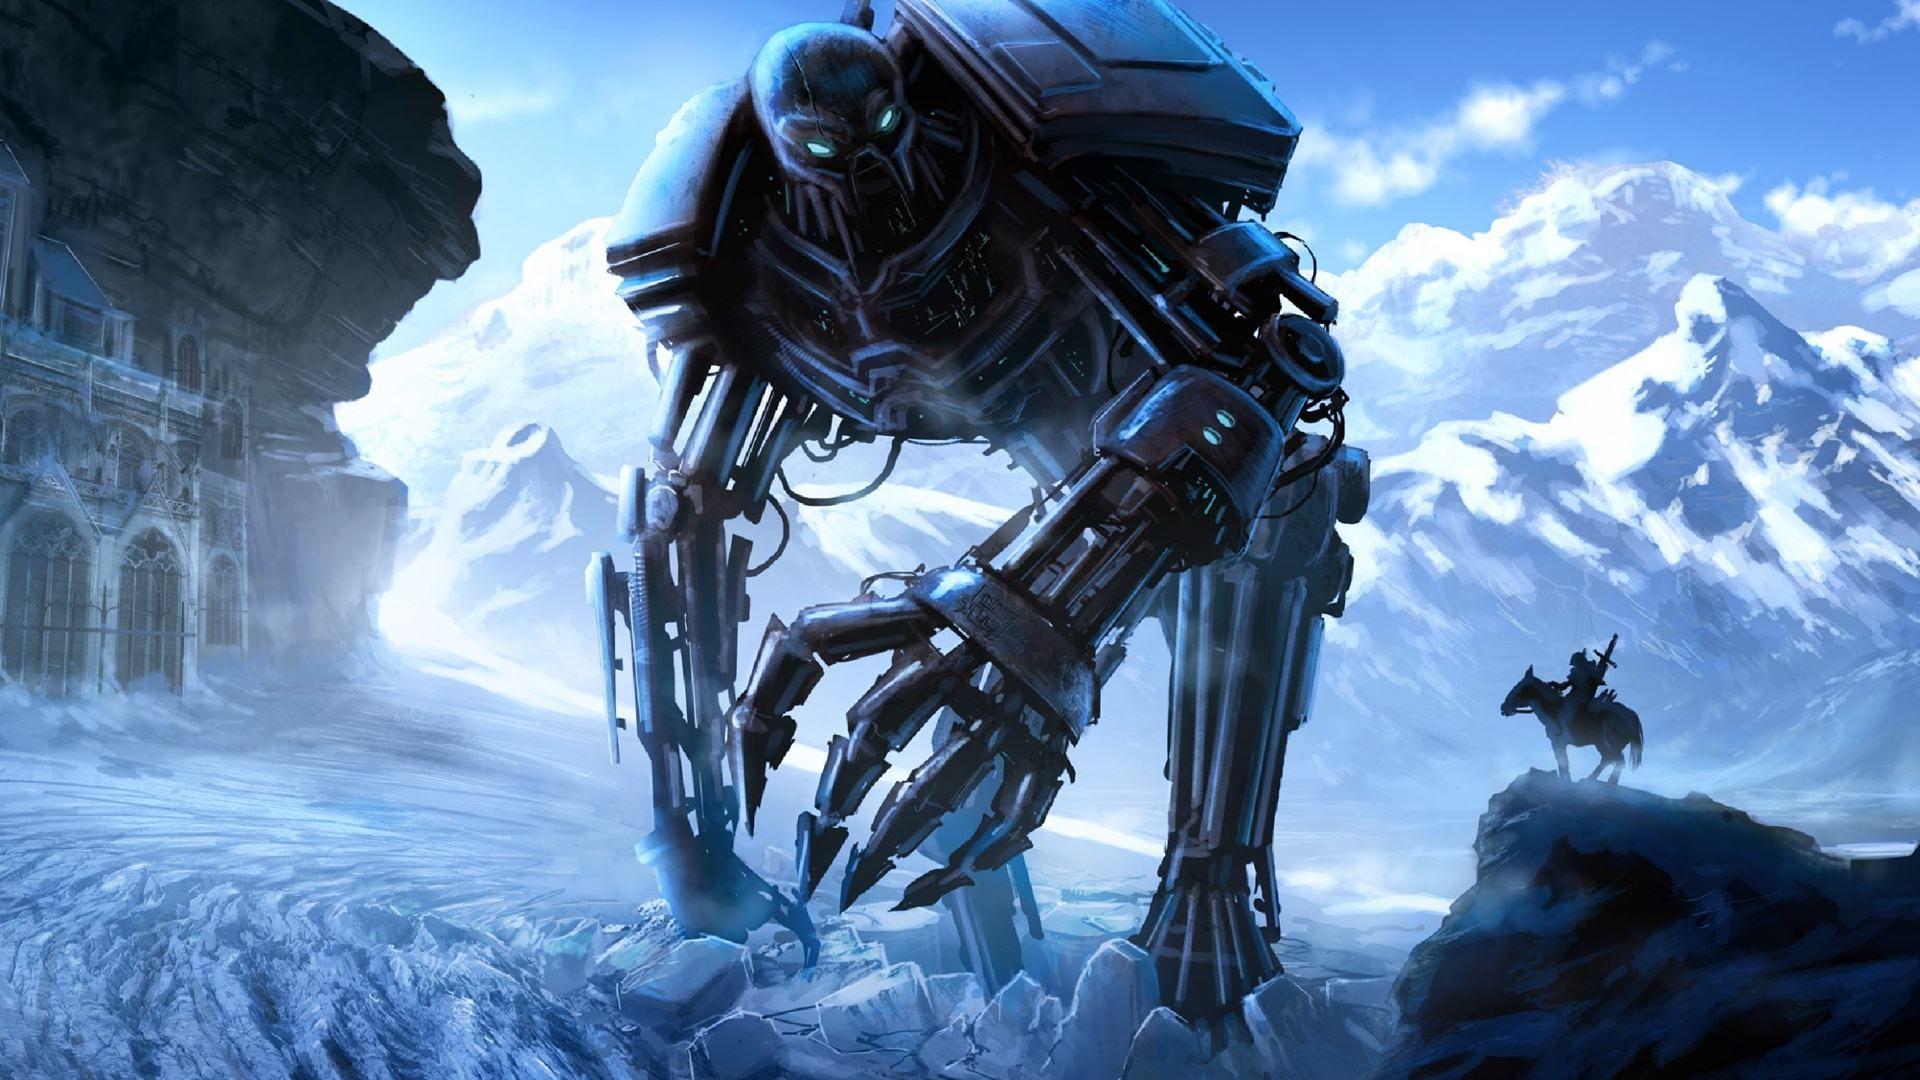 http://all-images.net/wallpaper-robot-sci-fi-hd-706/ Check more at http://all-images.net/wallpaper-robot-sci-fi-hd-706/